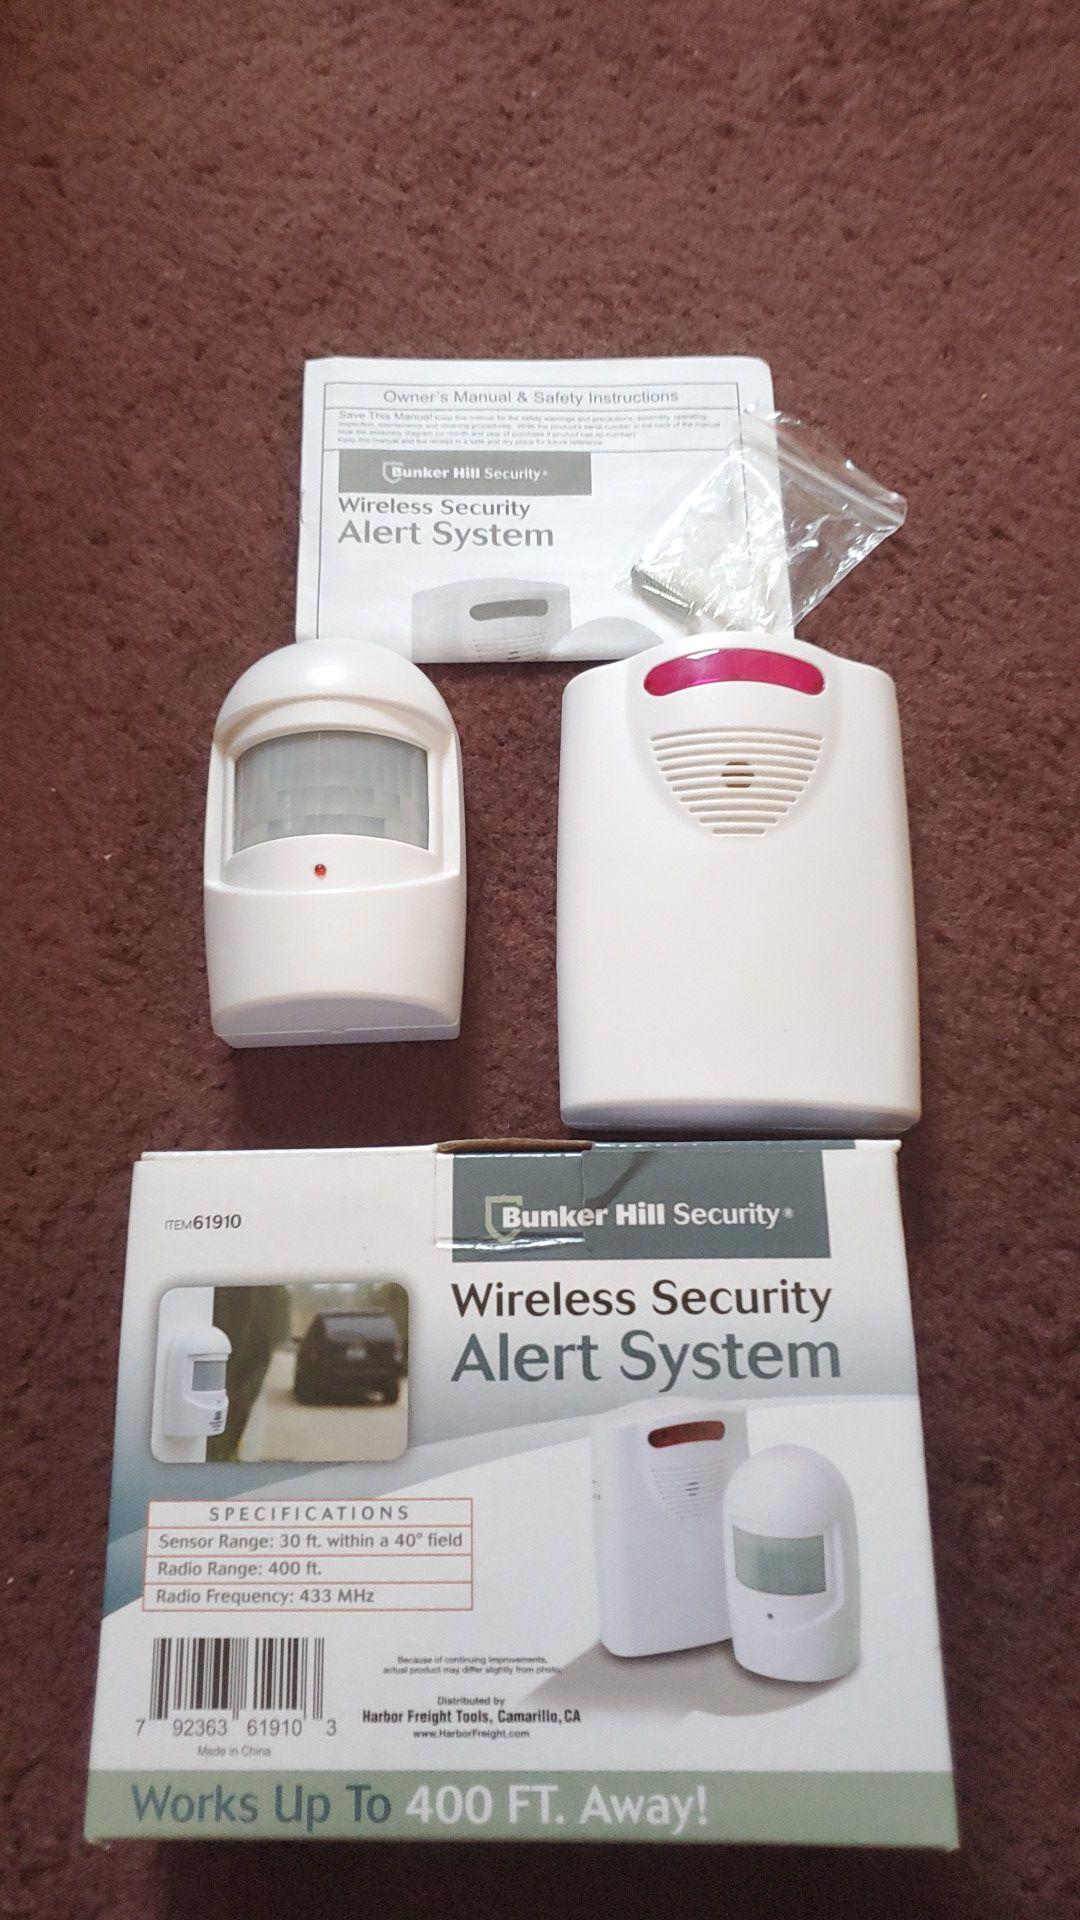 Alert System Wireless Bunker Hill Security